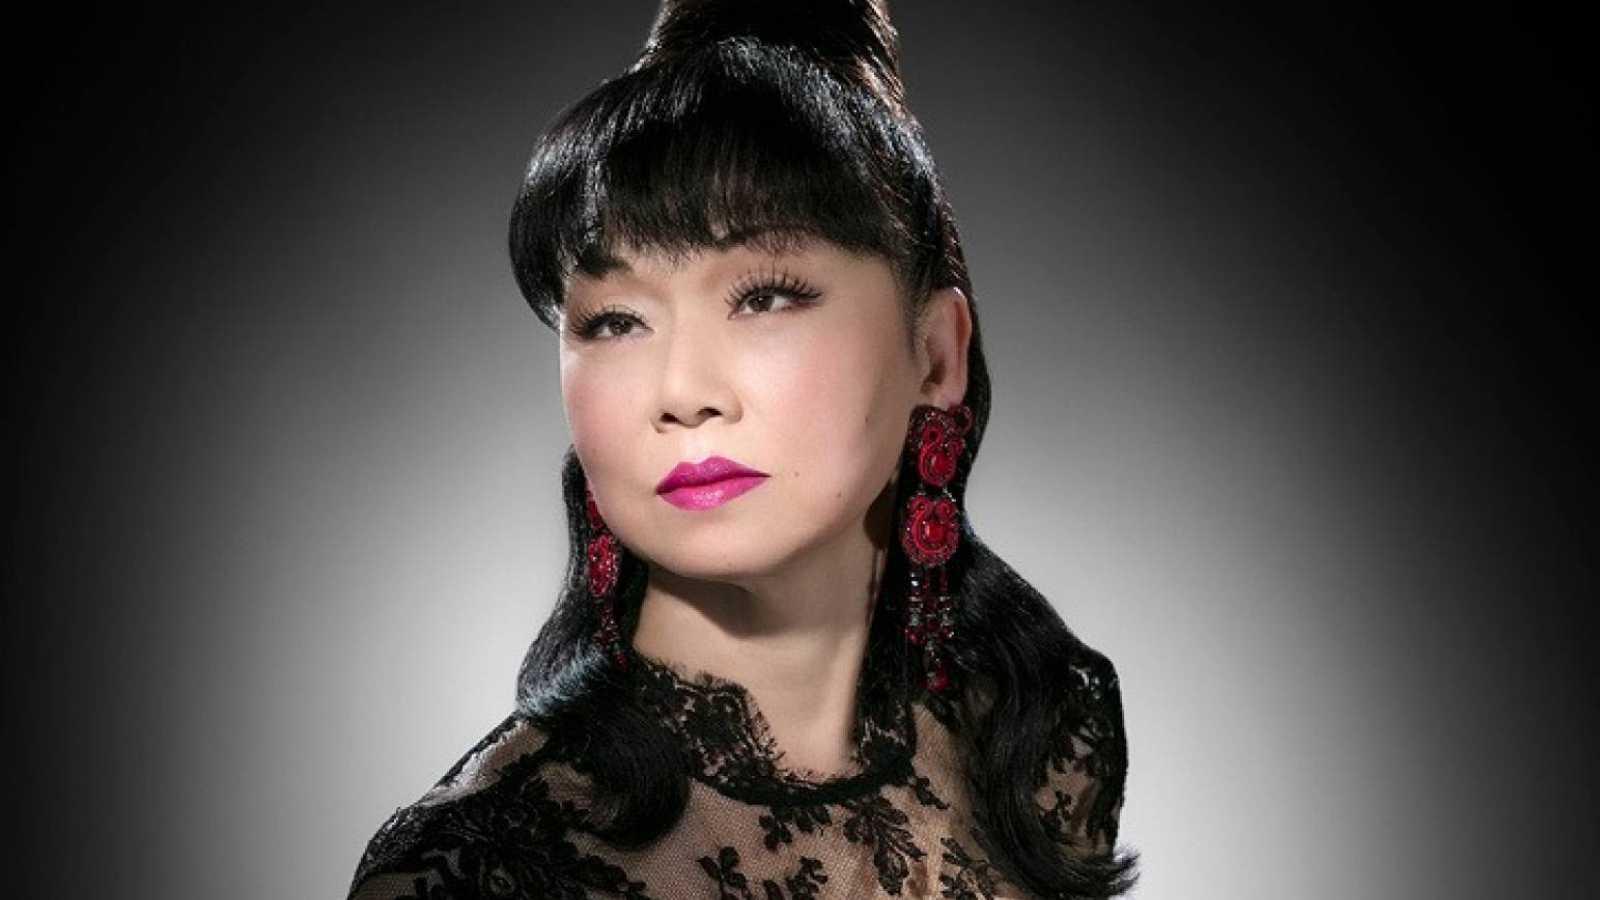 Concert de Kazuko Matsumoto à l'Olympia ce soir!